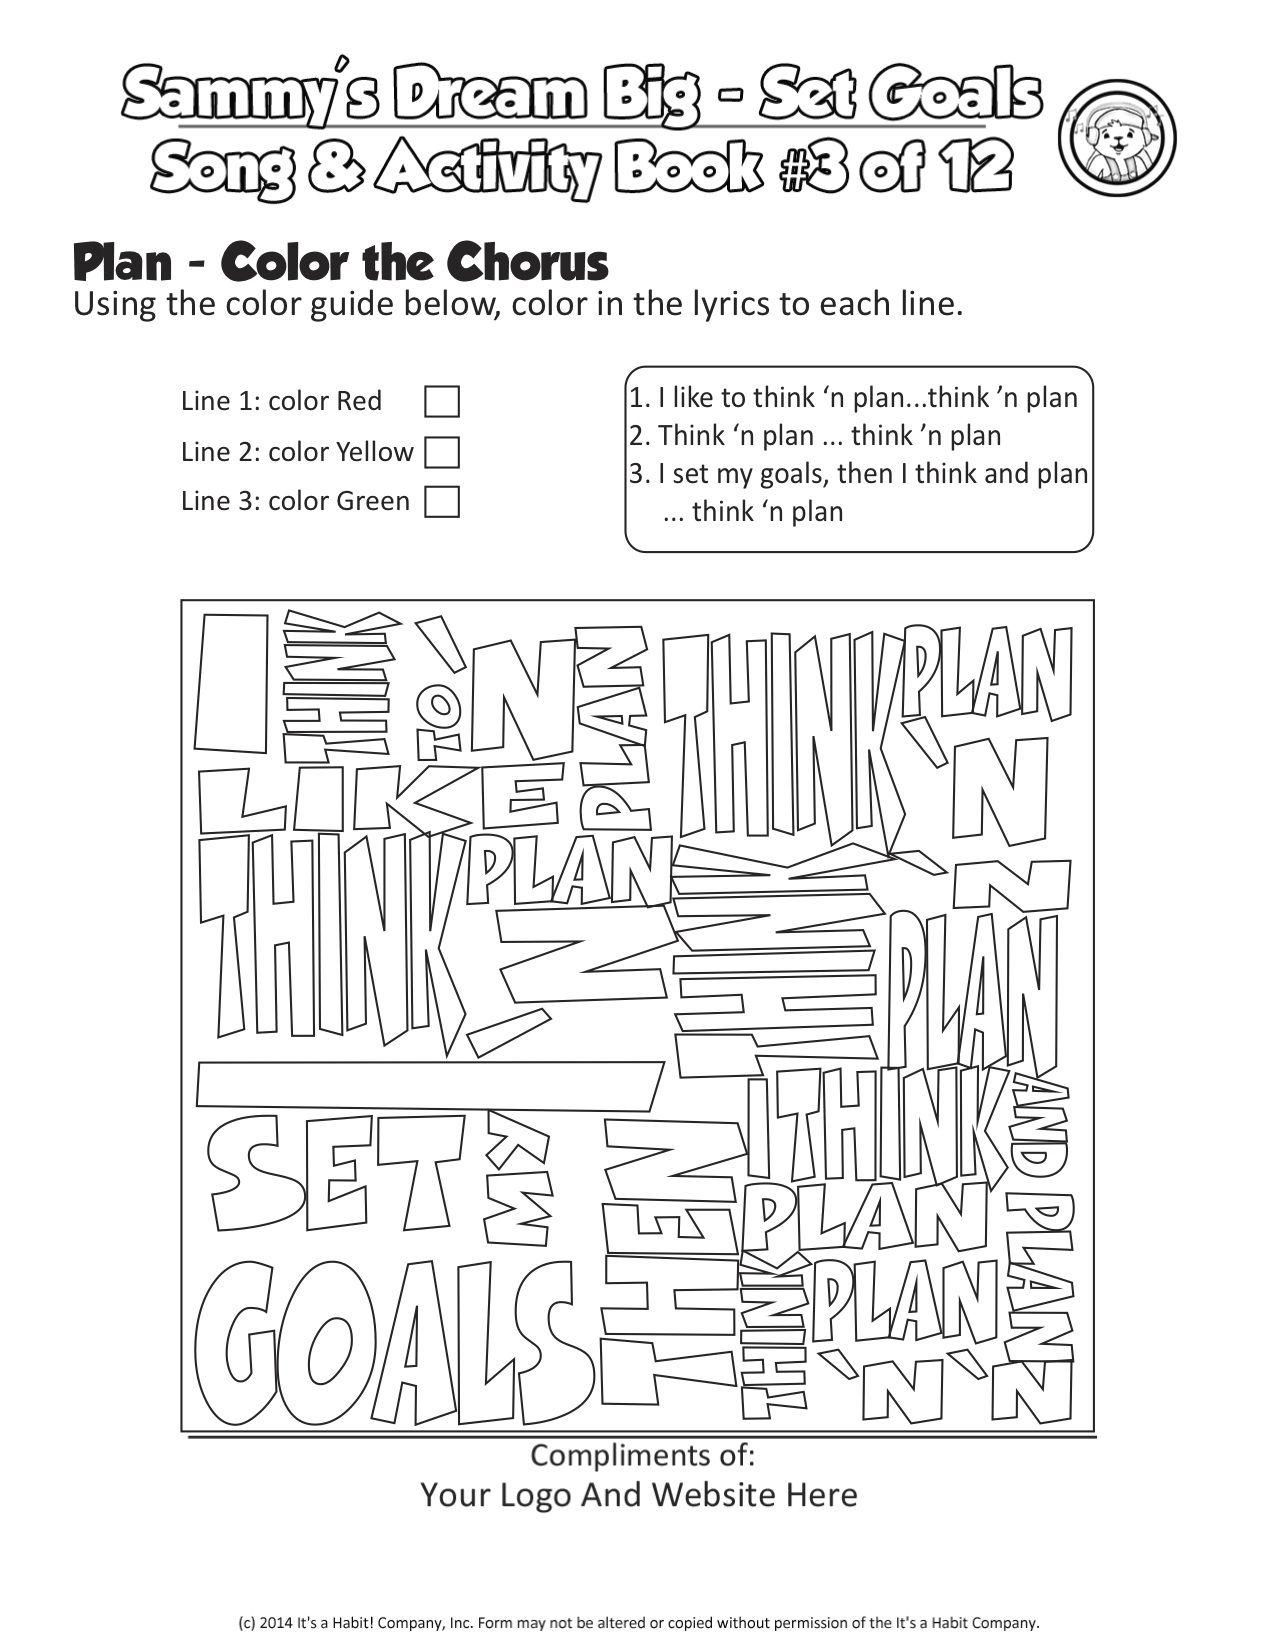 Sammy Rabbit Coloring Cloud Activity Sheet Worksheet Lyrics For Song Plan Teaches Kids Great